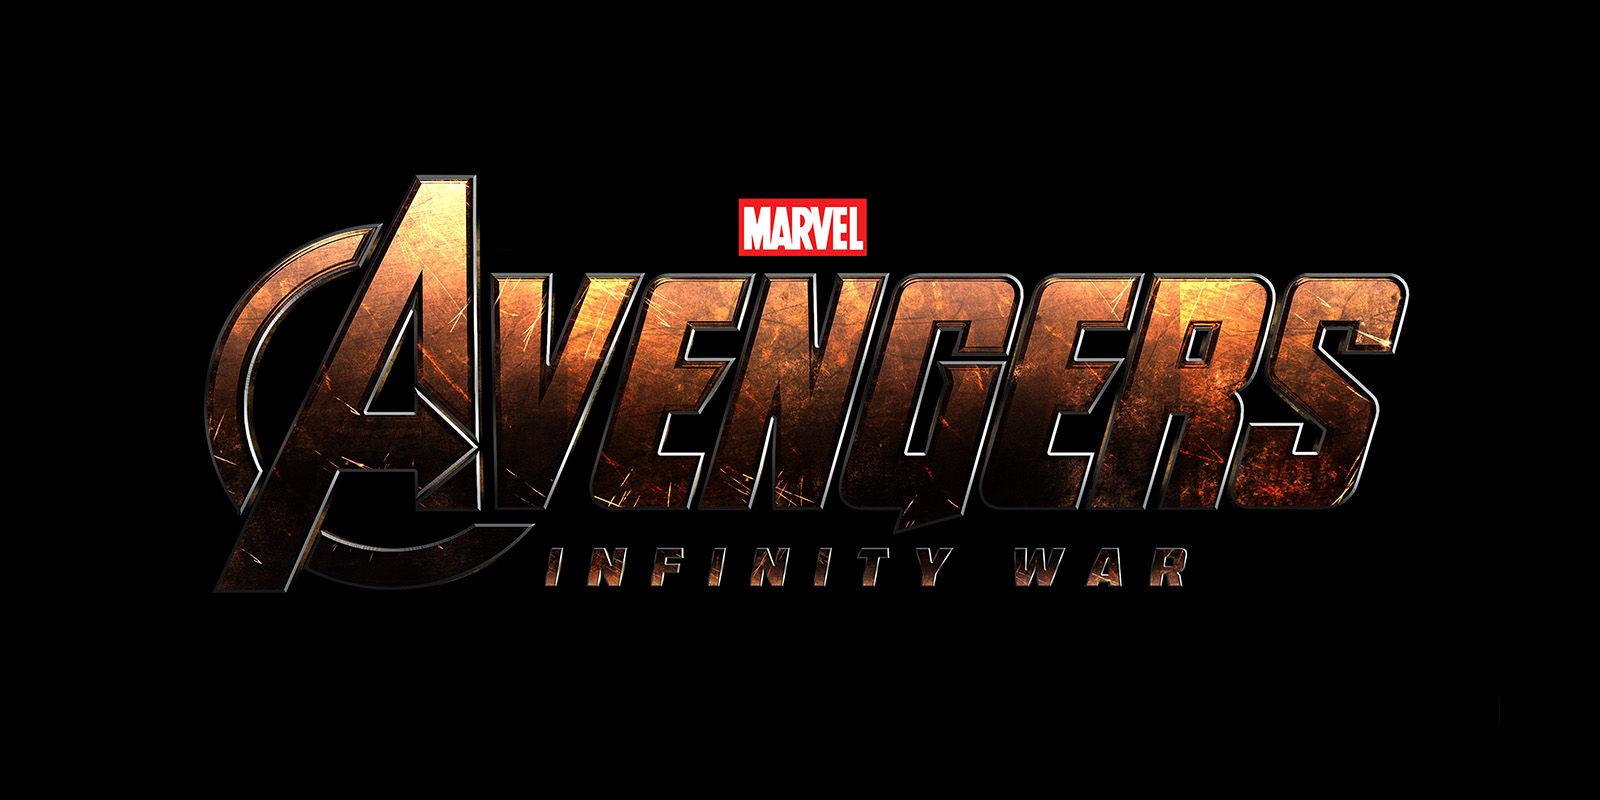 Mantis y más se suman a Avengers: Infinity War